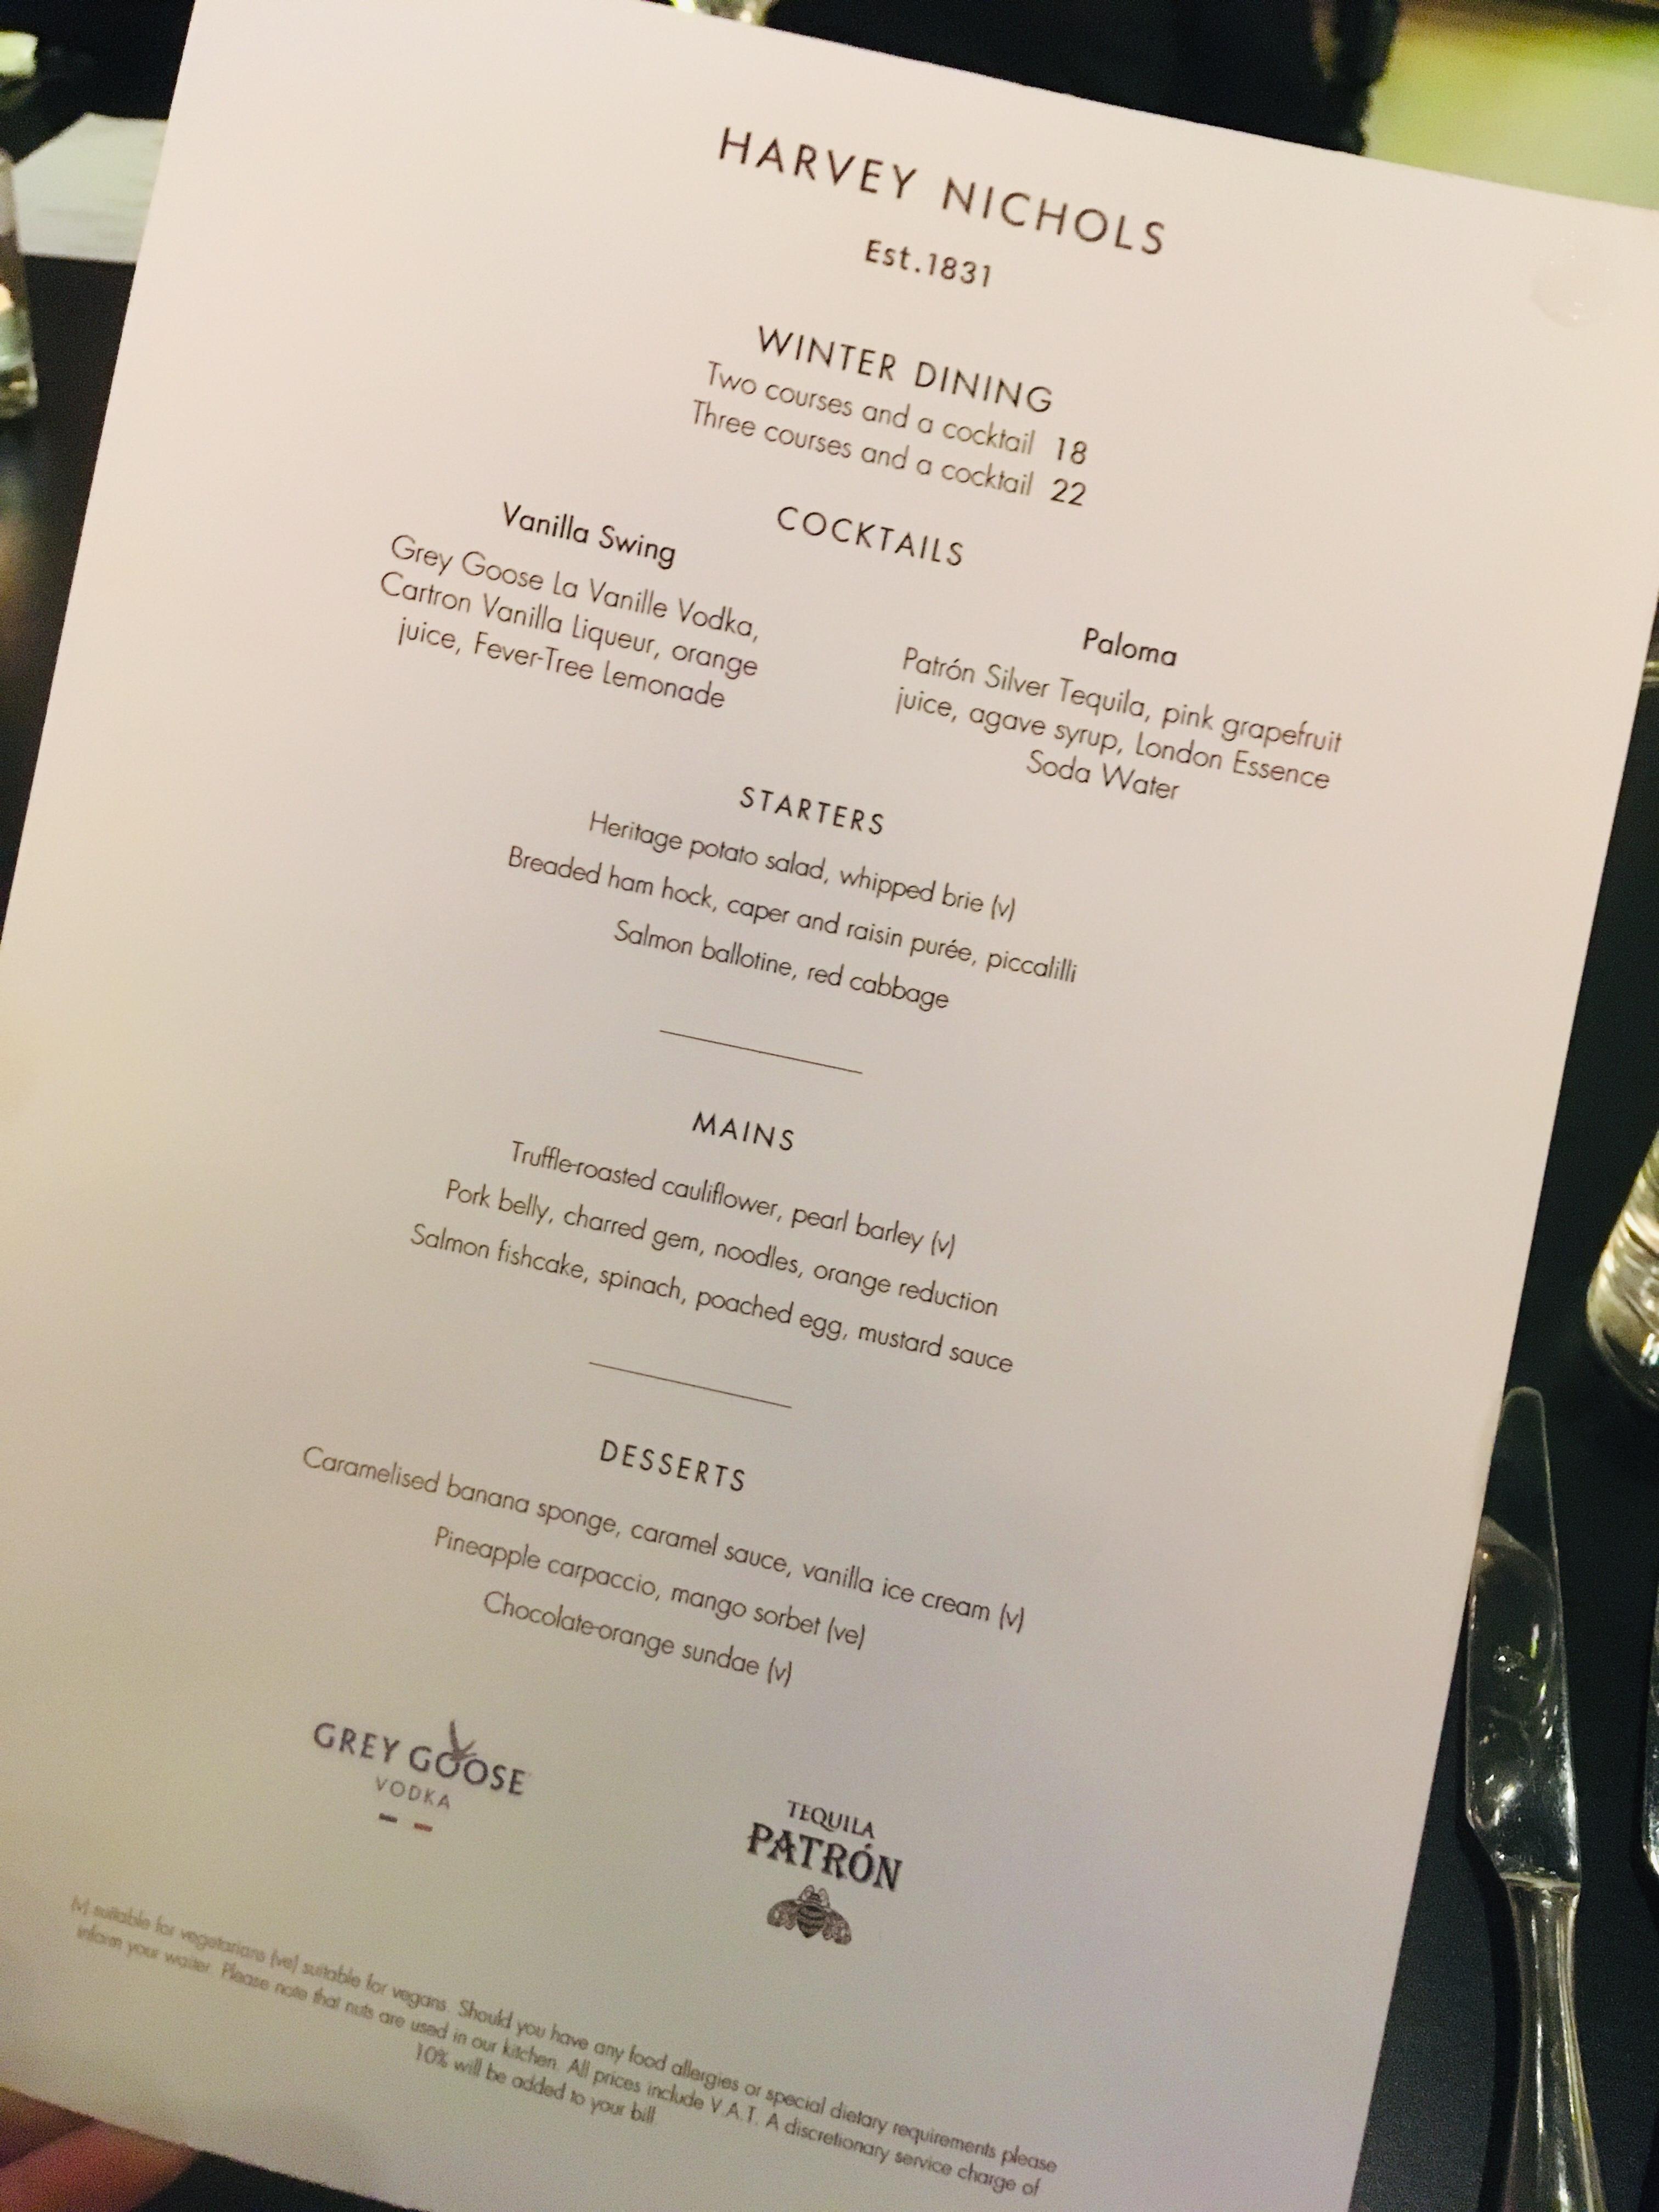 Wine tasting and dinner | Harvey Nichols Restaurant, Mailbox